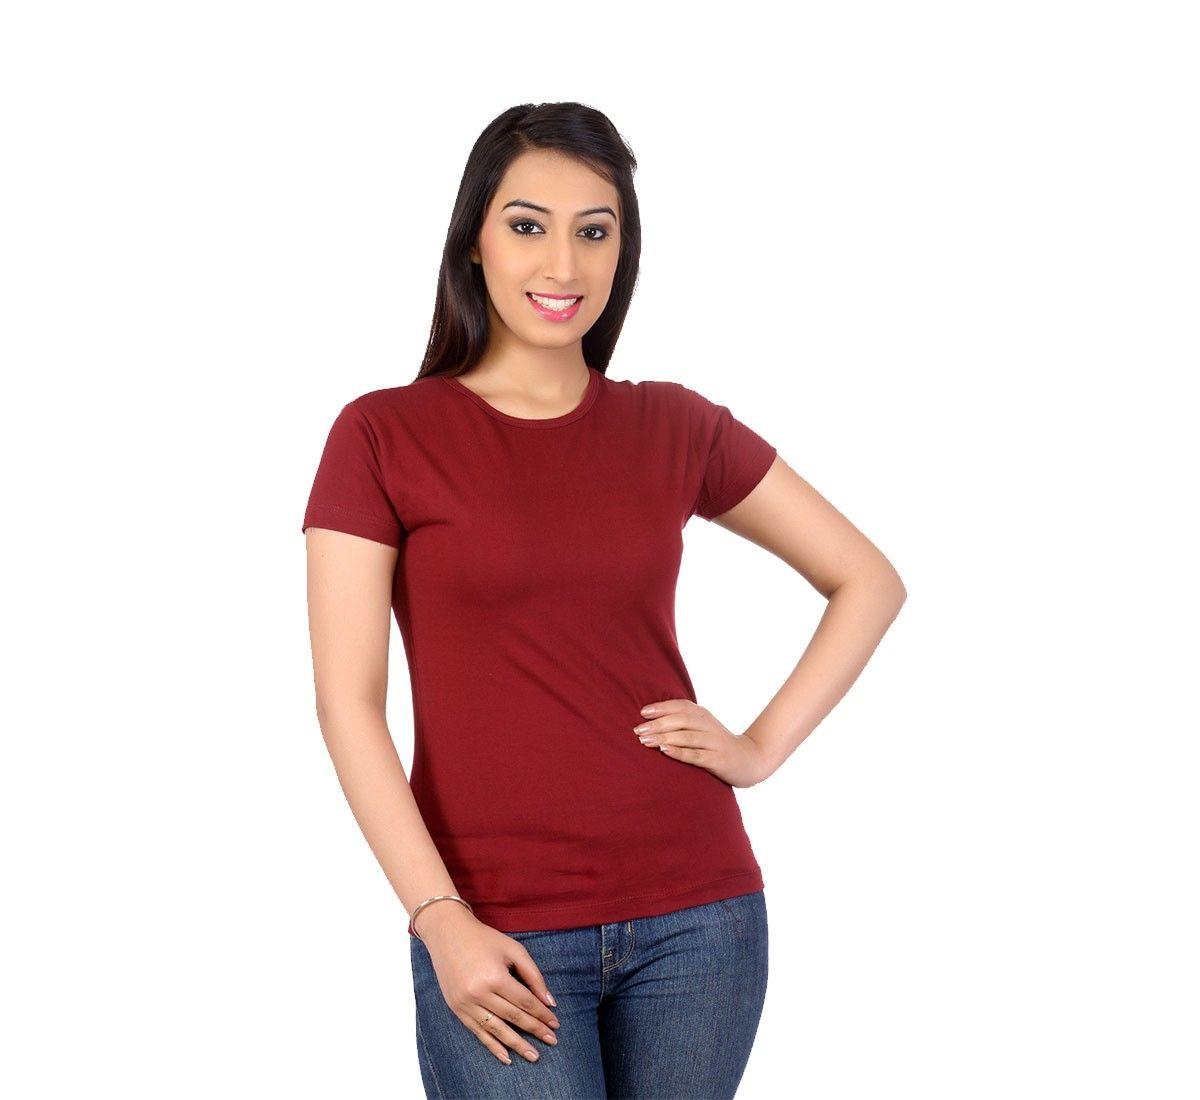 Teemoods Plain Maroon T Shirt Tm 1176 Women 39 S Tees